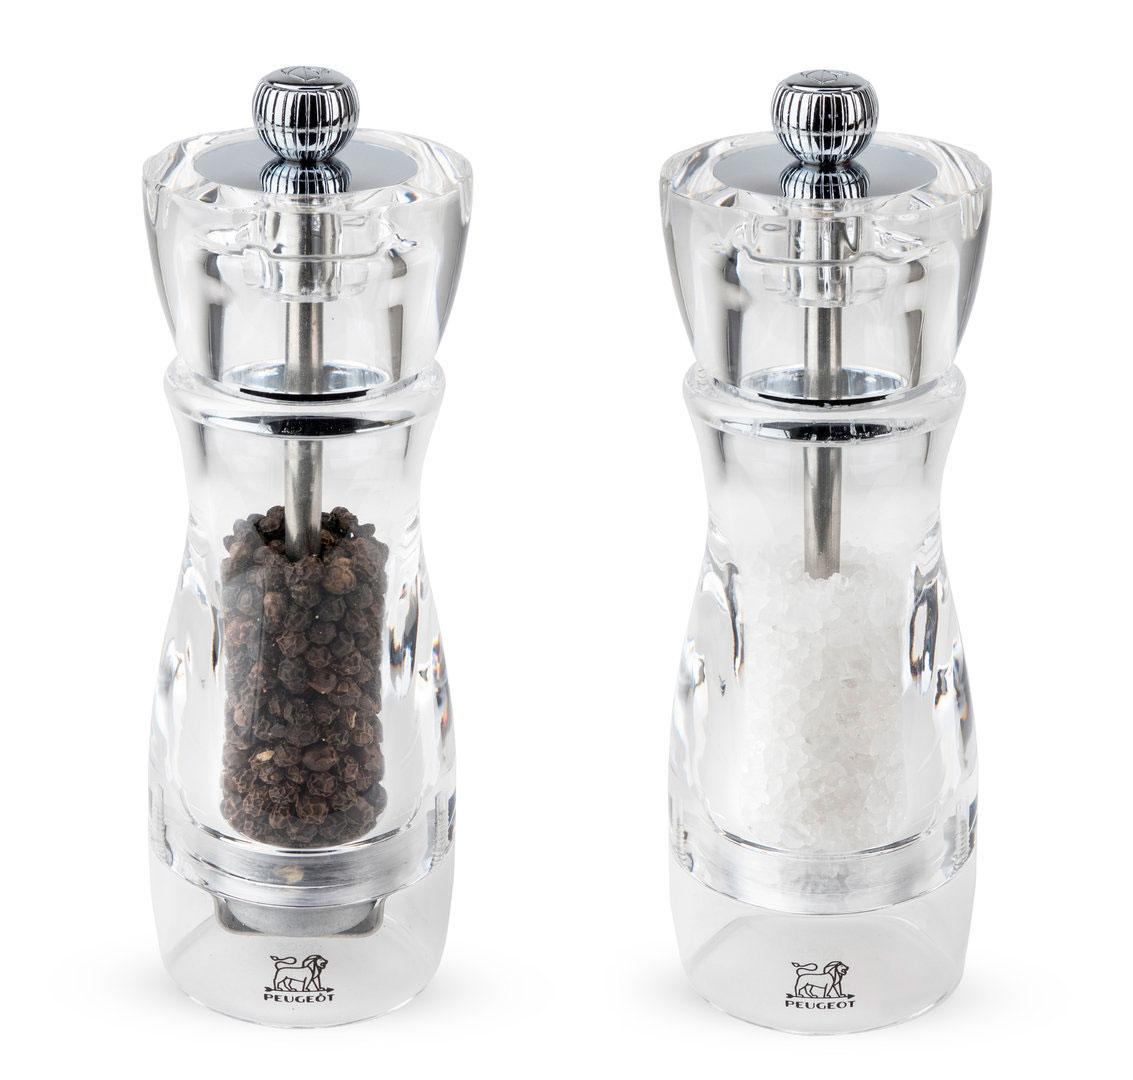 Мельница прозрачная Peugeot Vittel для соли